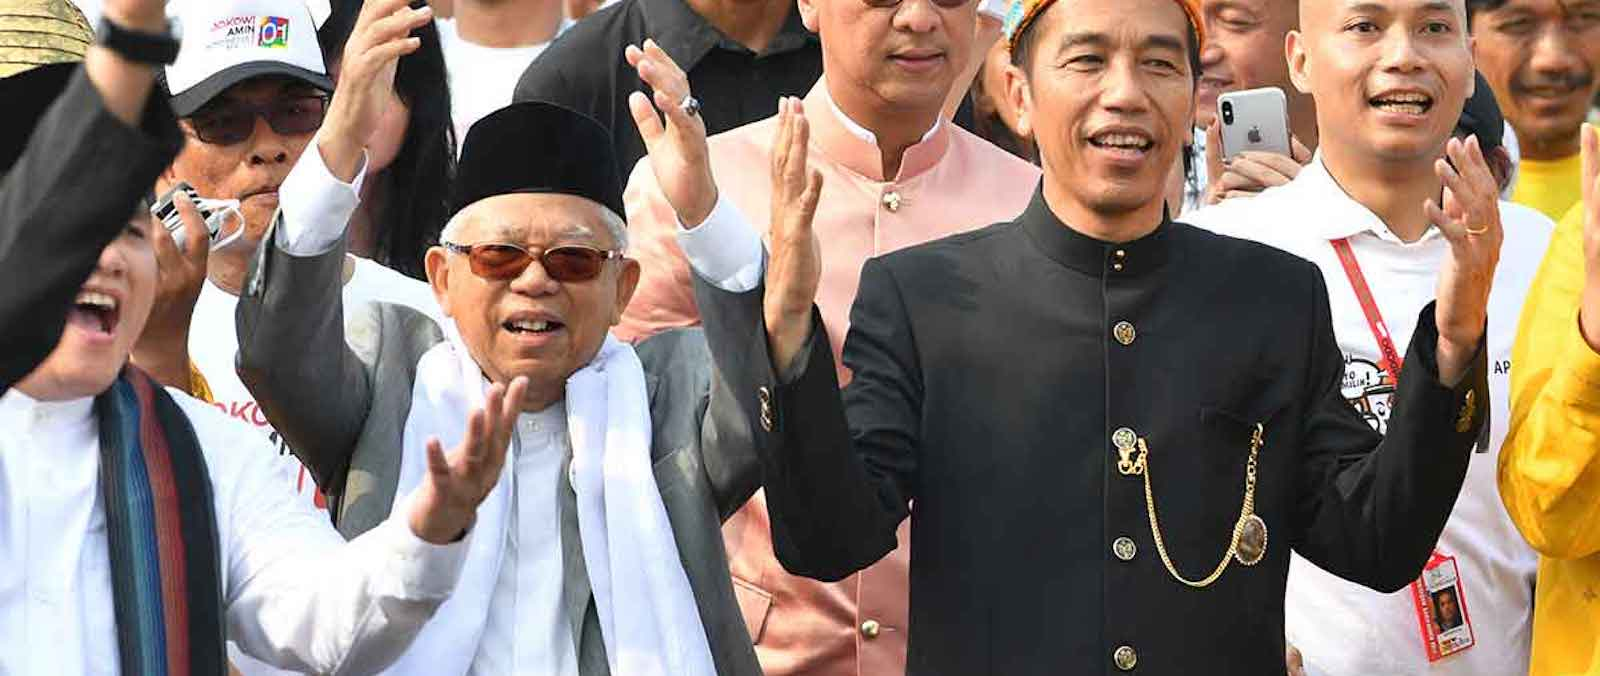 Indonesia's President Joko Widodo (R) and his running mate Ma'ruf Amin (L) (Photo: andisanjaya/ Flickr)